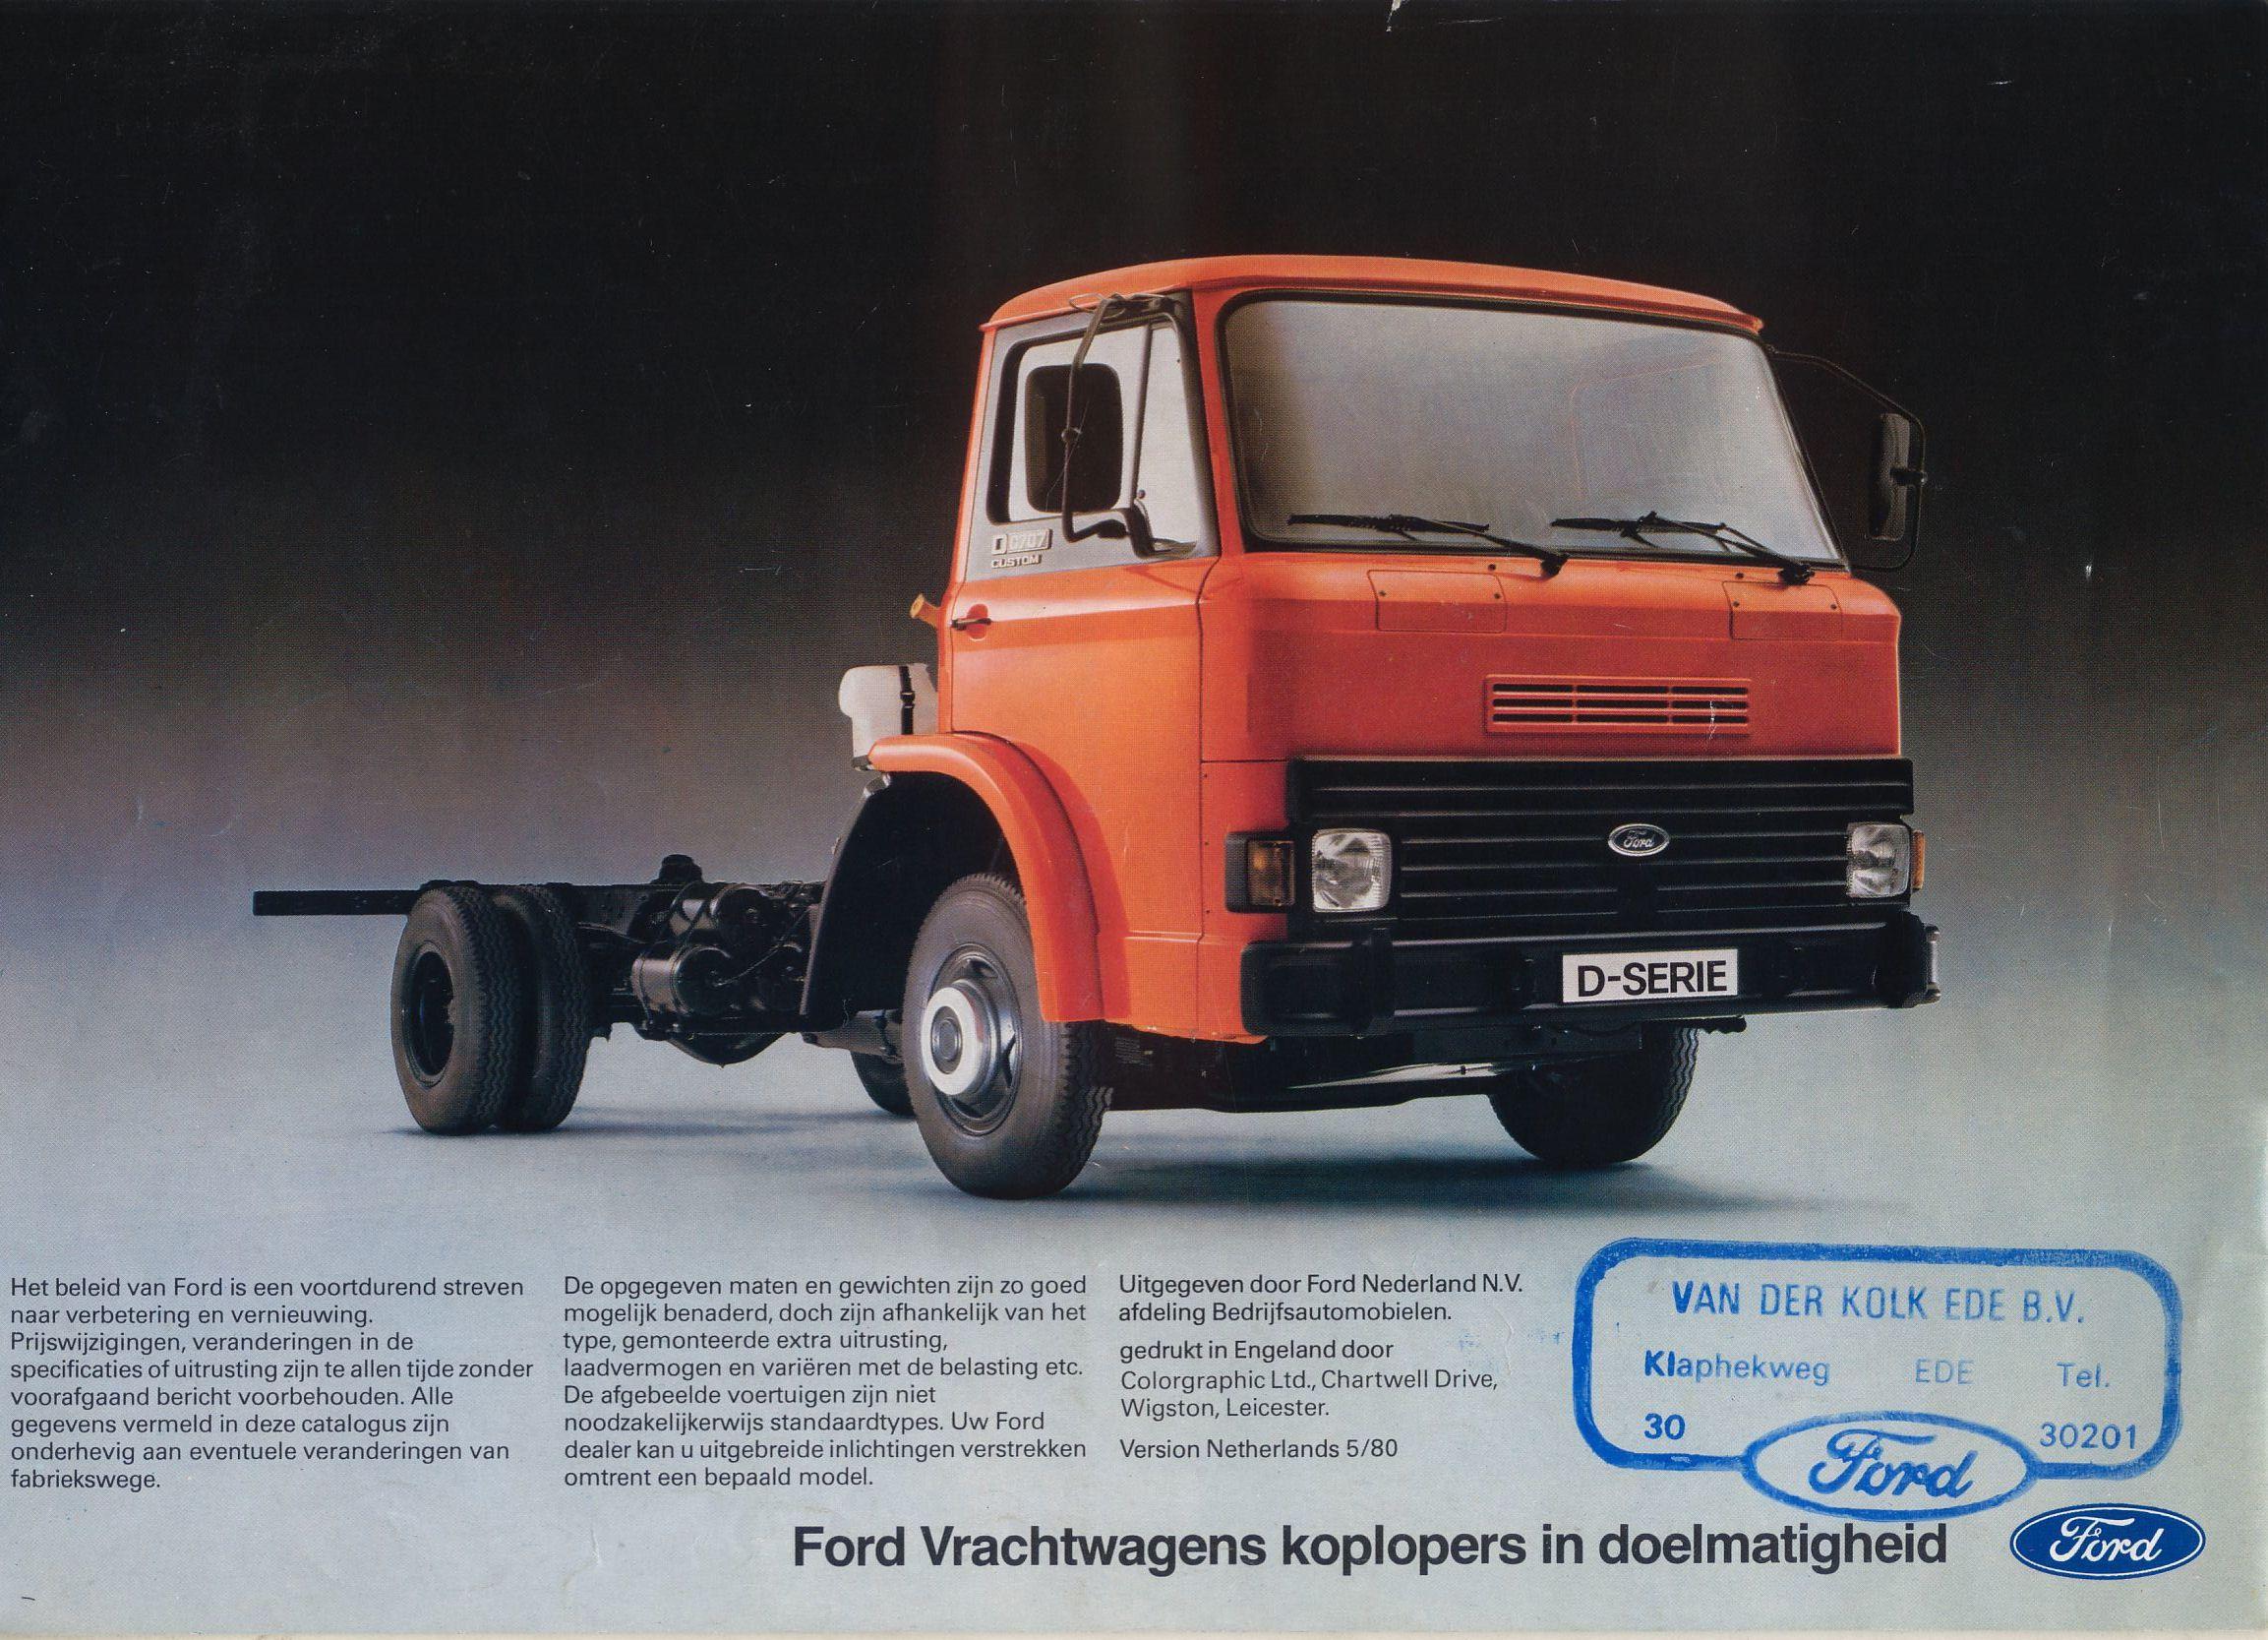 1980 Ford D Series brochure